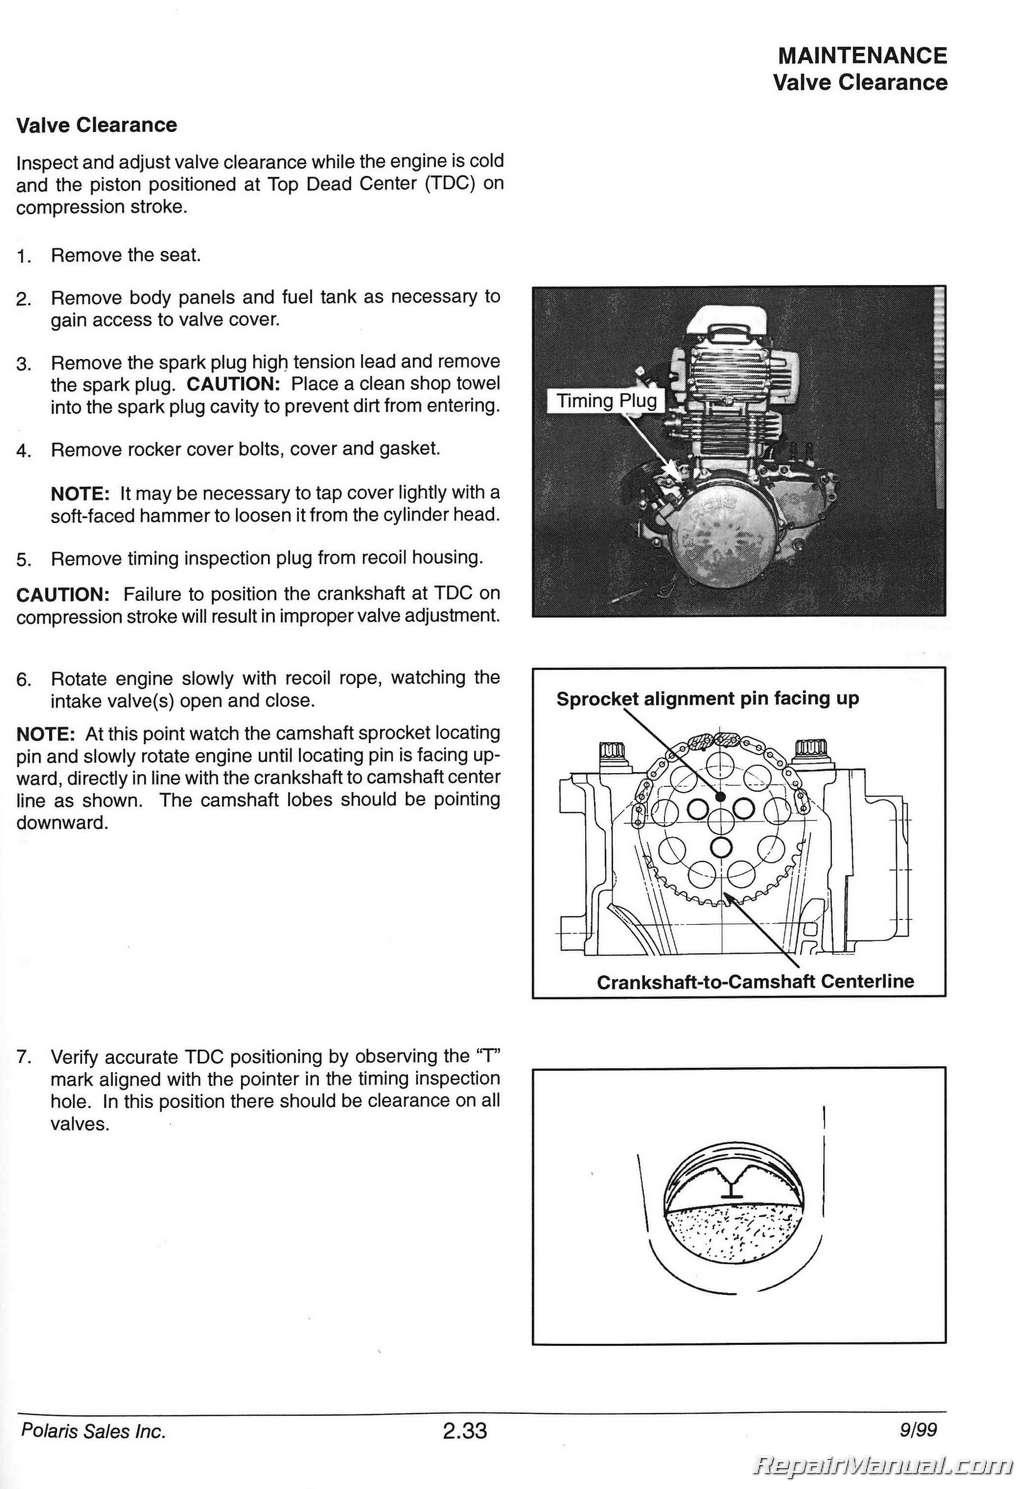 1996 Polaris Sportsman 400 Wiring Diagram - efcaviation.com on polaris atv wiring diagrams online, polaris explorer 400 exhaust, polaris explorer 4x4 wiring, polaris wire diagrams, polaris explorer 400 carburetor, polaris explorer 400 solenoid, polaris 300 4x4 wiring board,